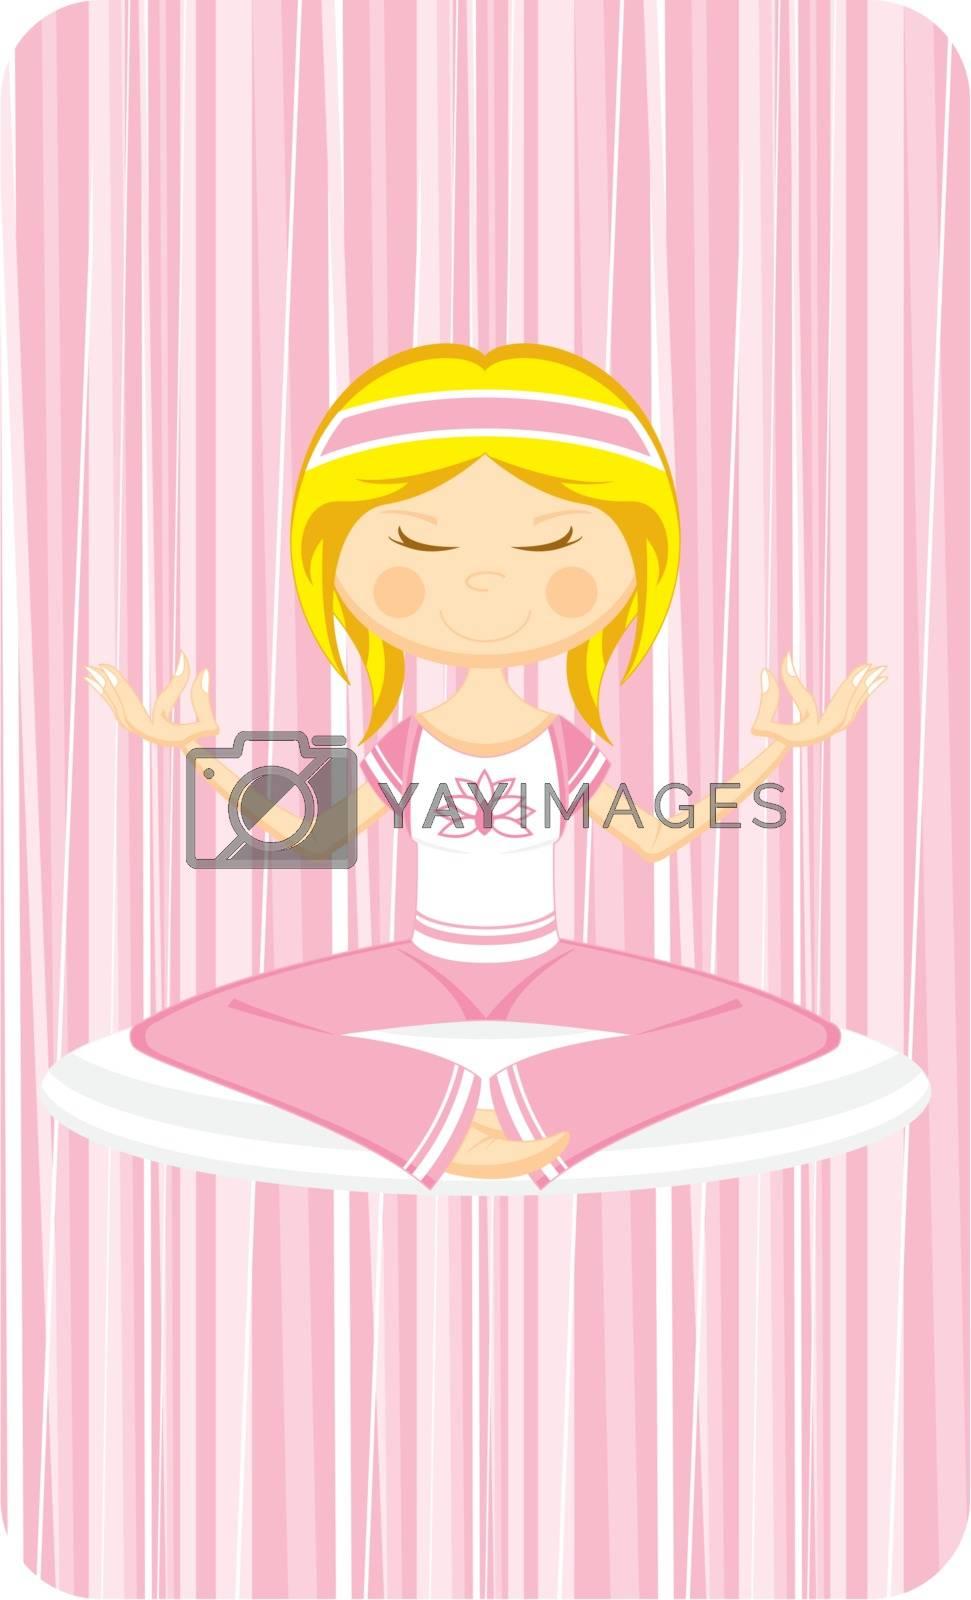 Cute Cartoon Yoga Girl by markmurphycreative